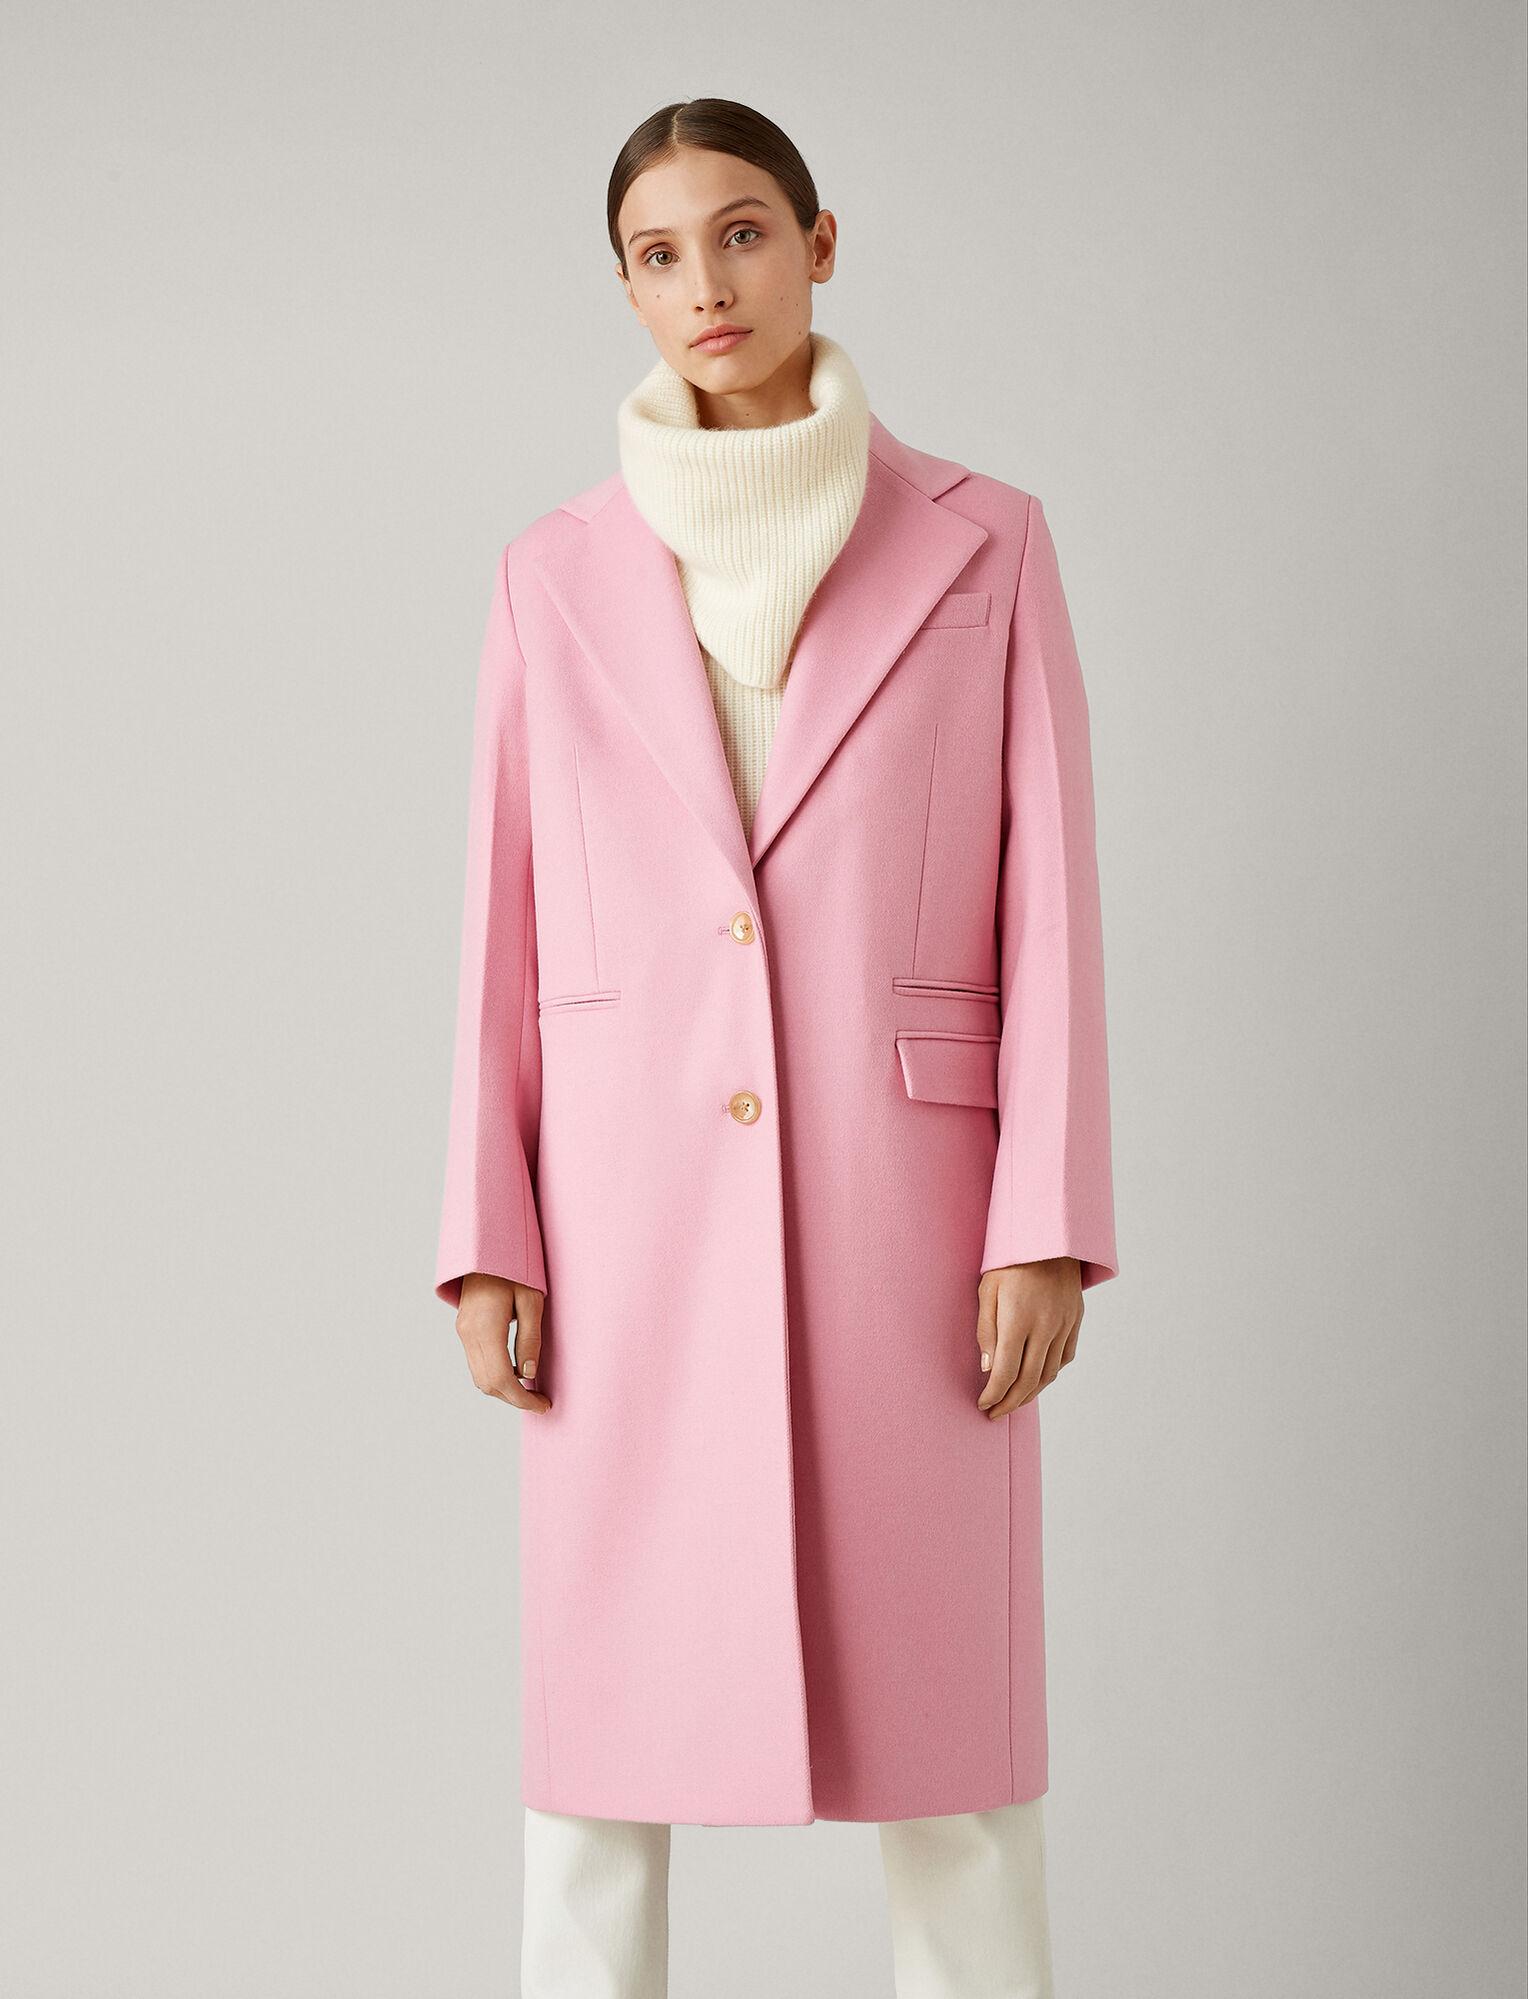 Joseph, New Magnus Double Wool Gloss Coat, in CARNATION